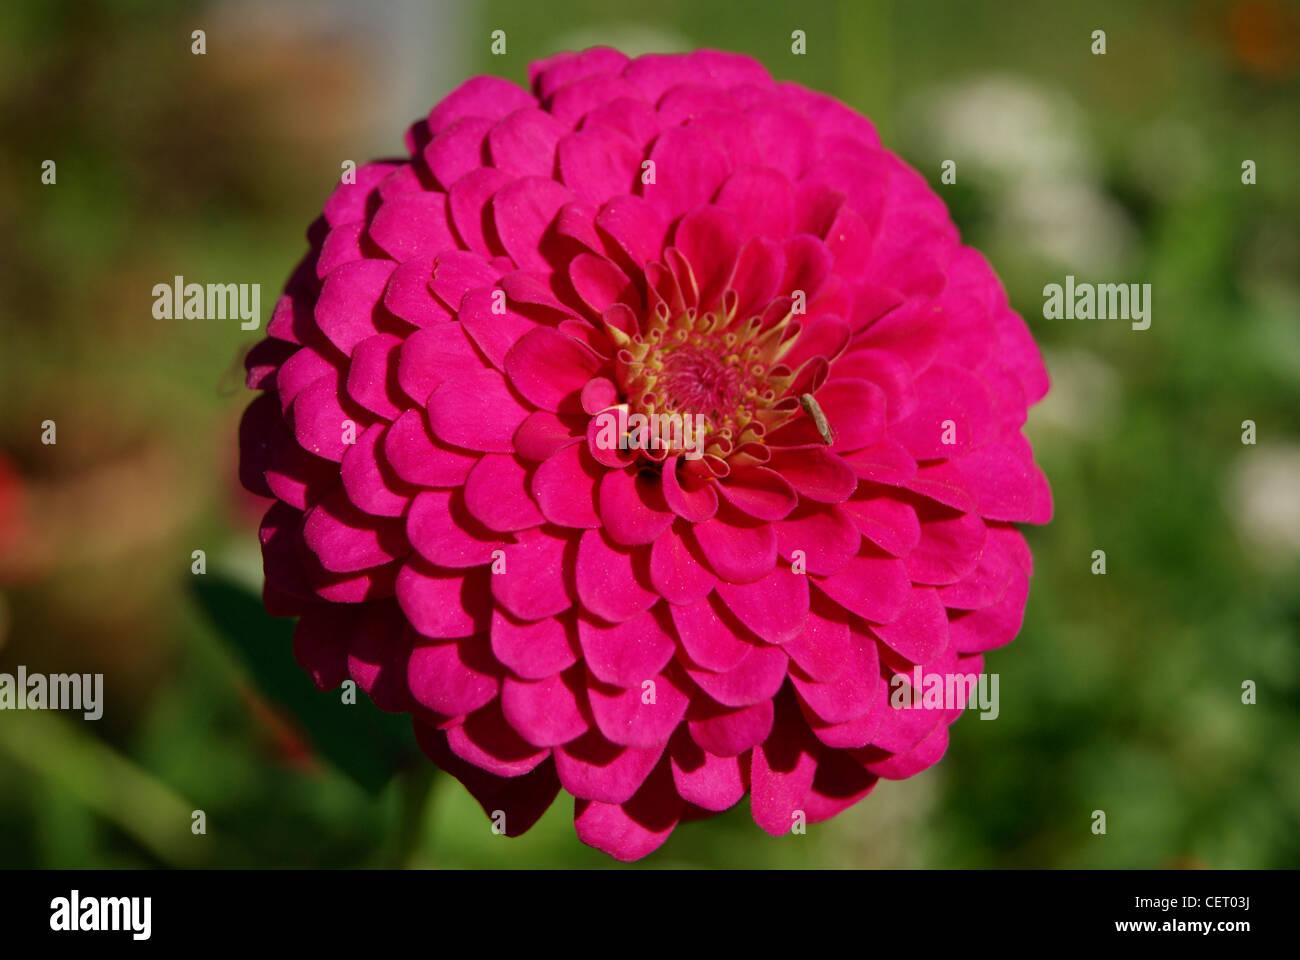 Red dahlia flower in green gardenralaindia stock photo 43552870 red dahlia flower in green gardenralaindia izmirmasajfo